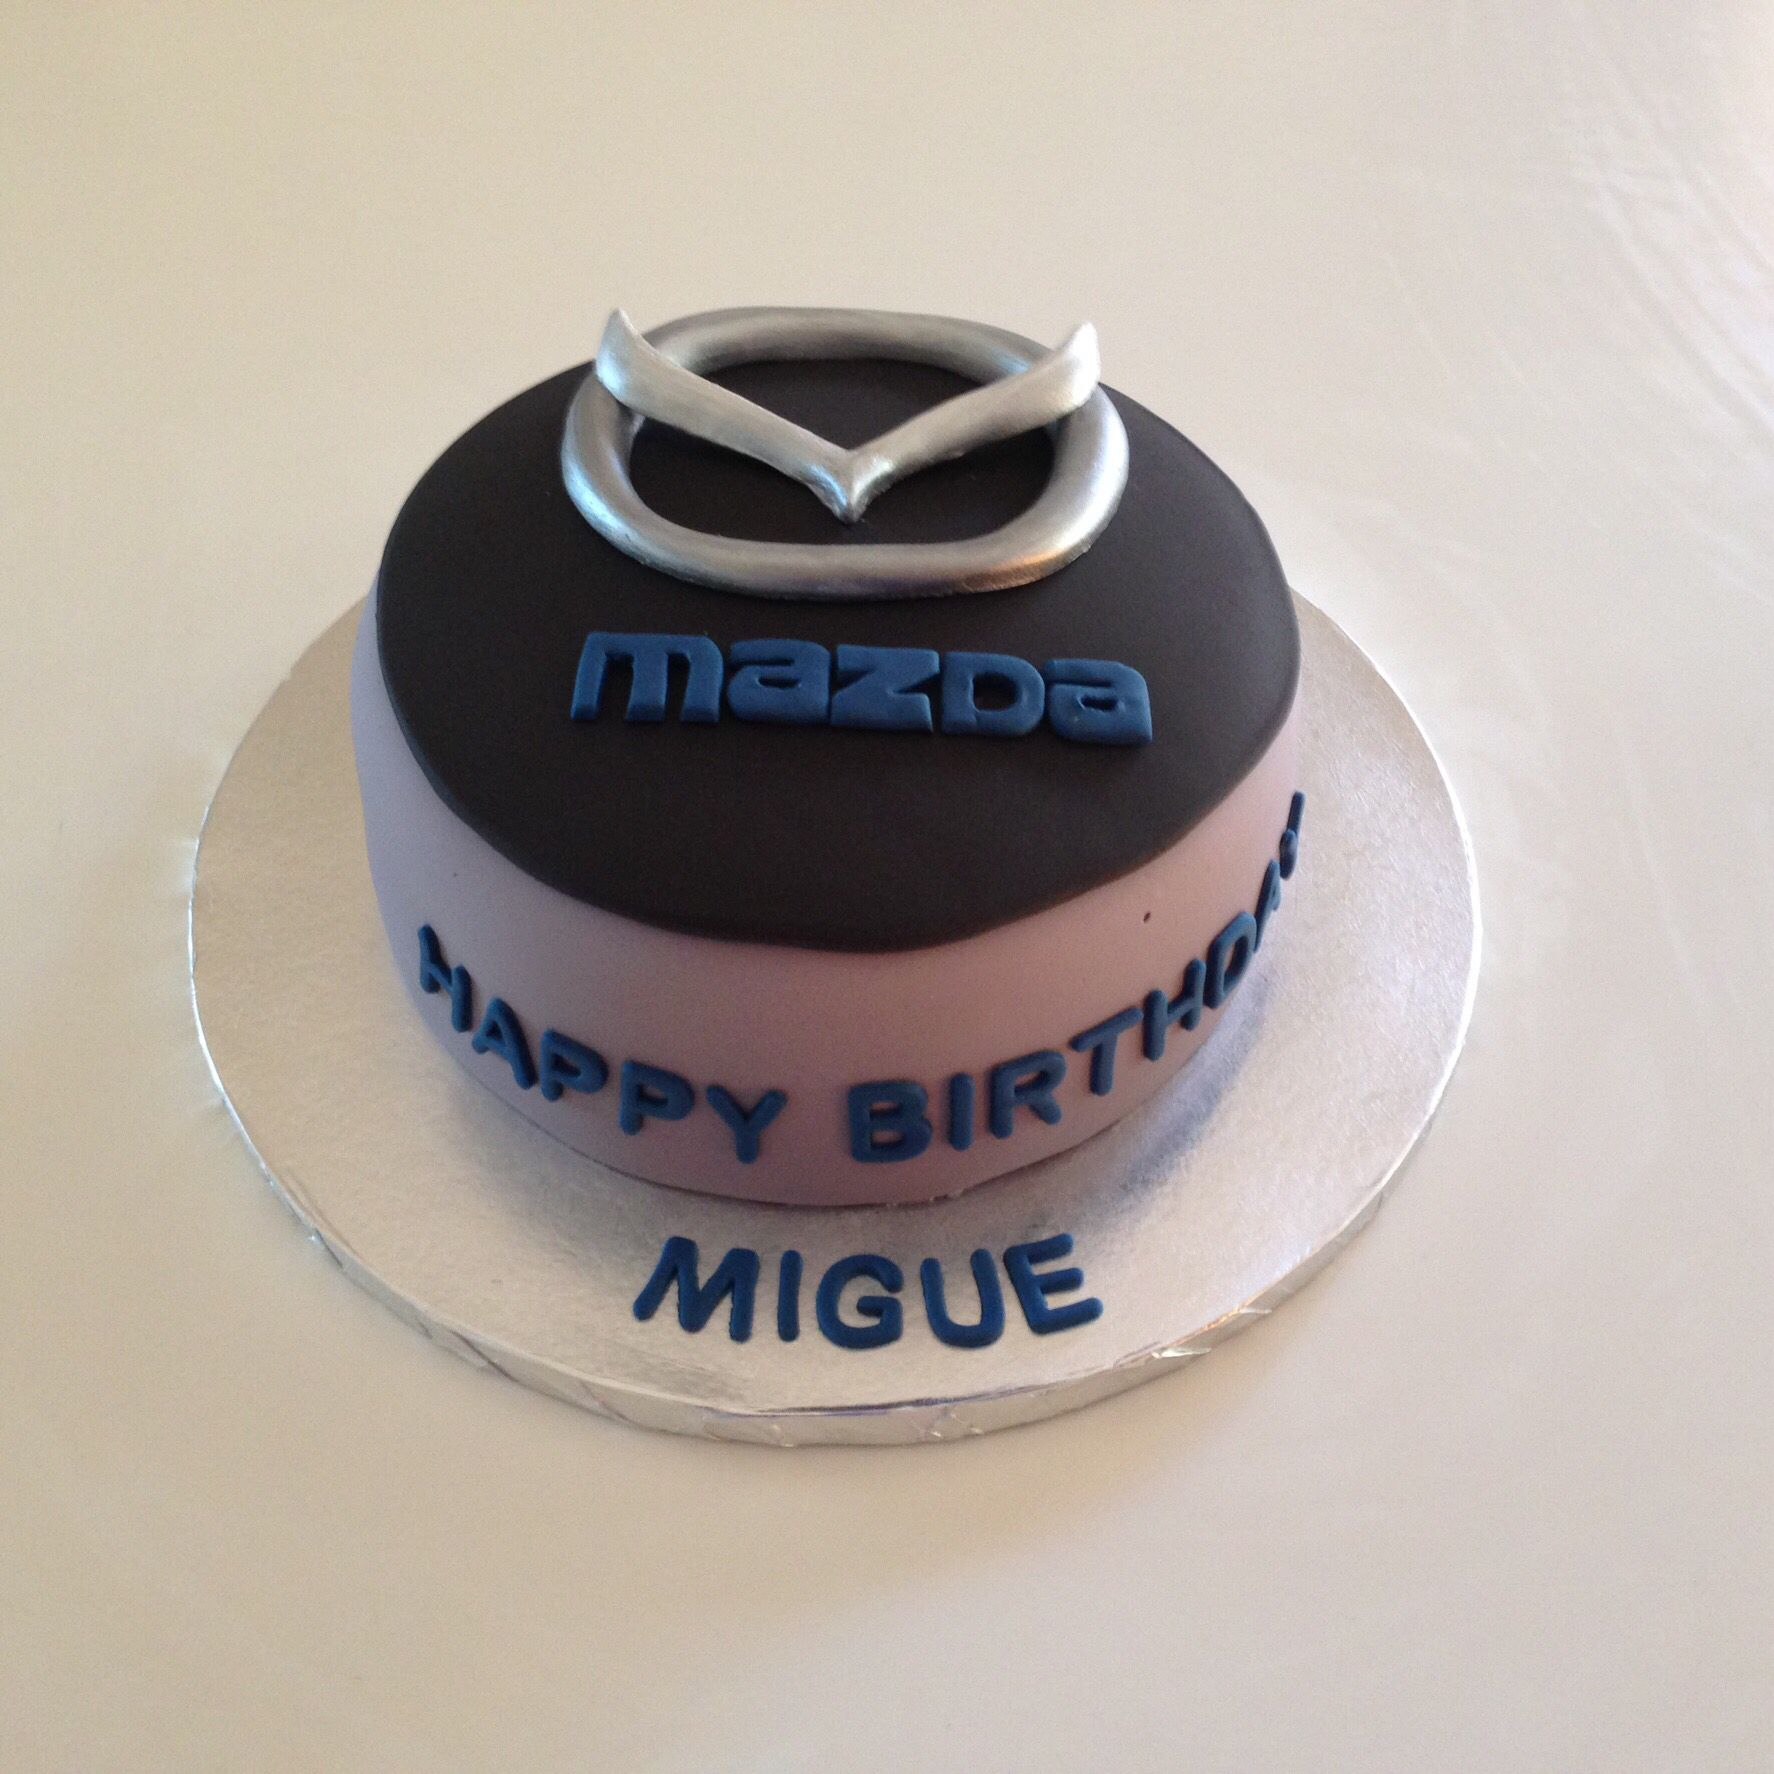 Mazda Cake Cake Decorating Videos Cake Logo Cake